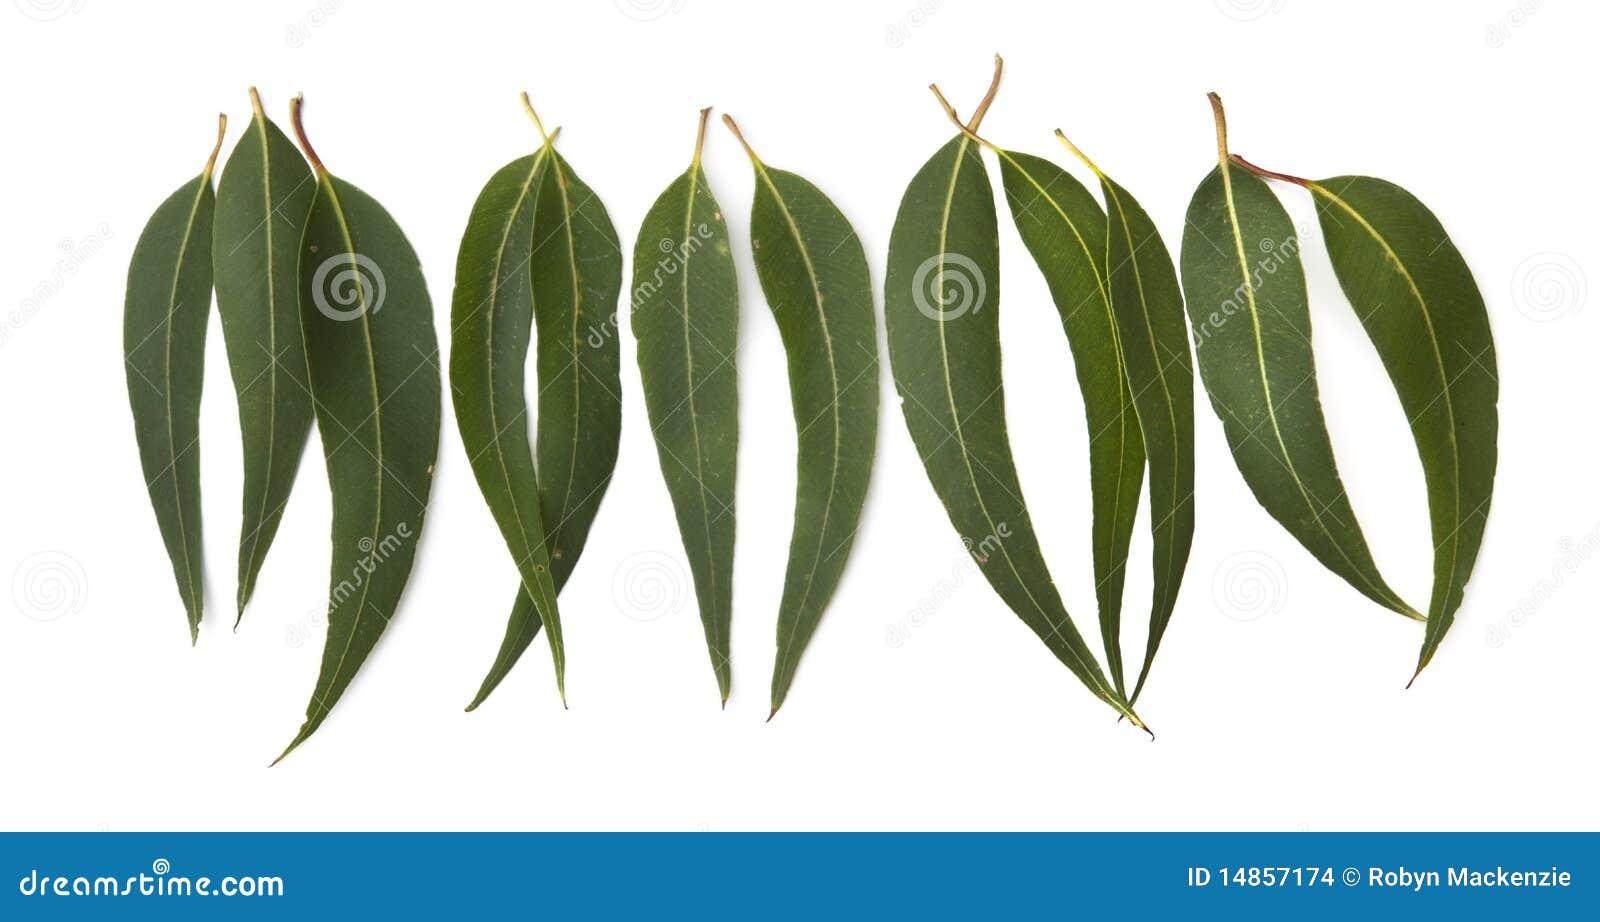 clipart gum leaves - photo #28